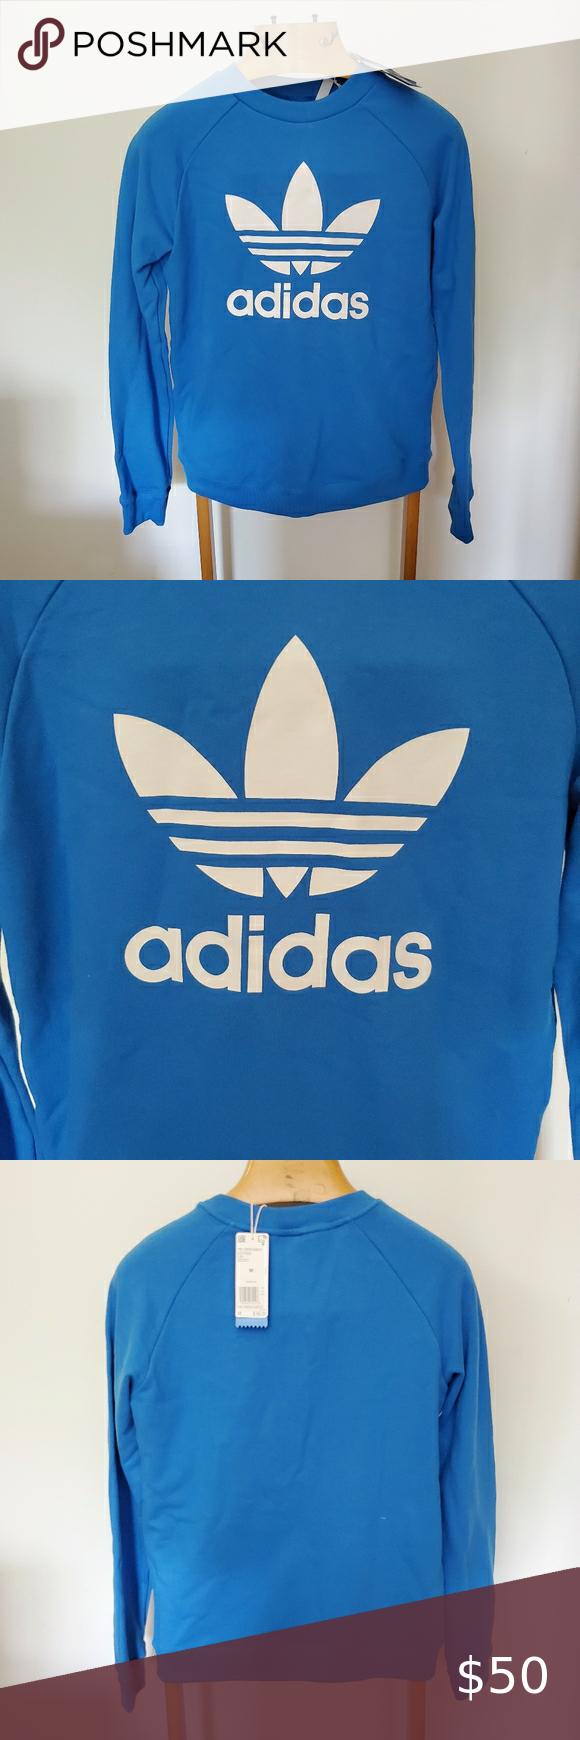 Adidas Blue Trefoil Crewneck Sweatshirt M Blue Adidas Crew Neck Sweatshirt Adidas Sweater [ 1740 x 580 Pixel ]